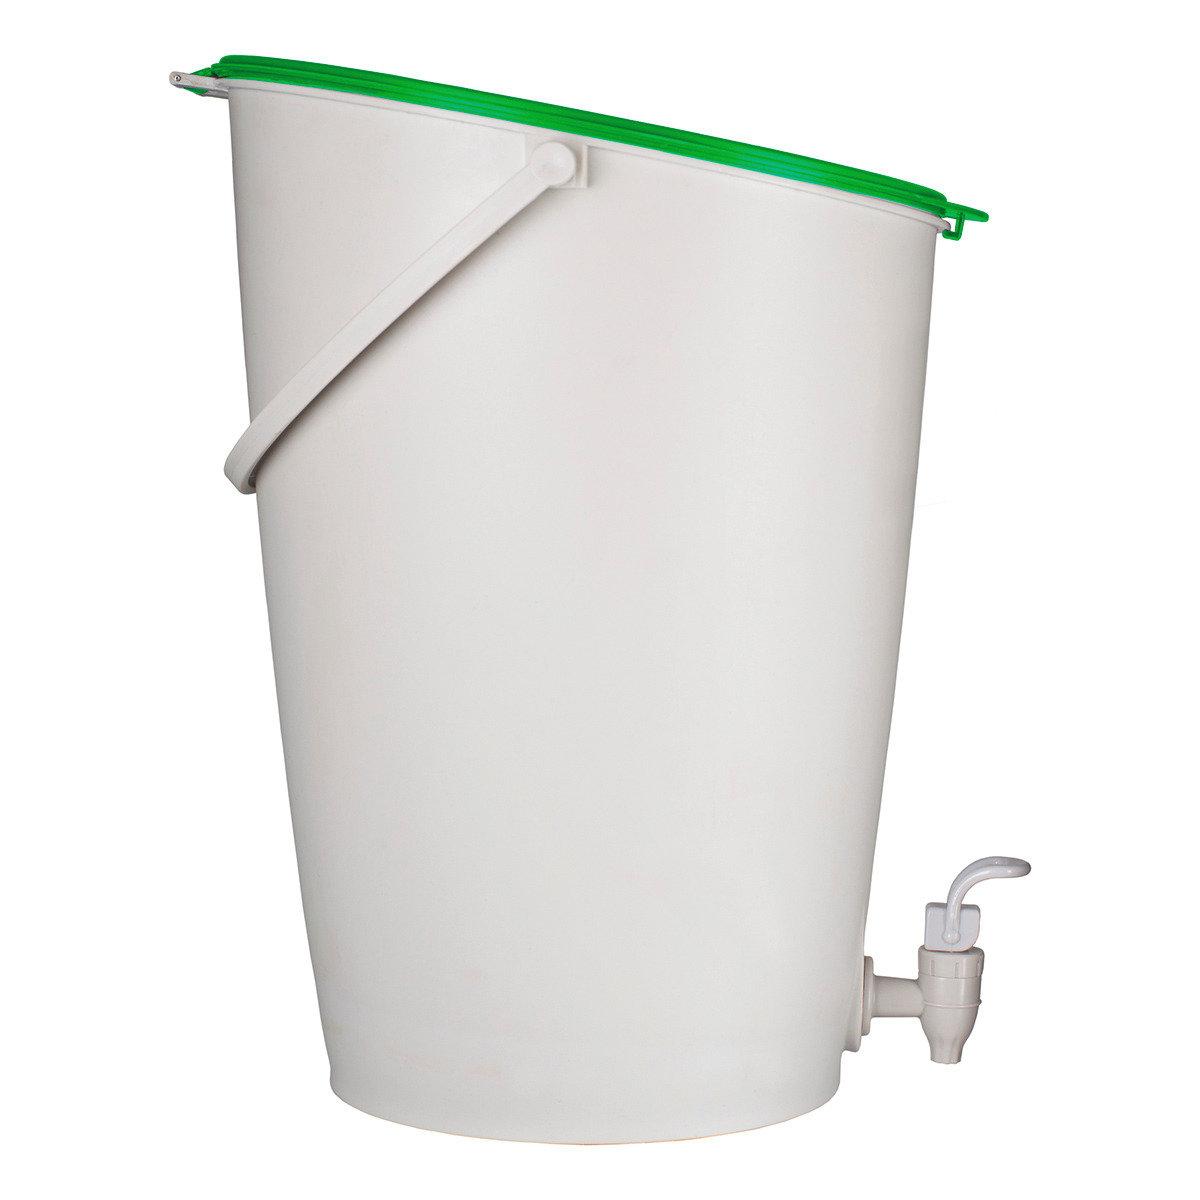 Urban Komposter 15 Liter, inkl. Kompost Beschleuniger | #5